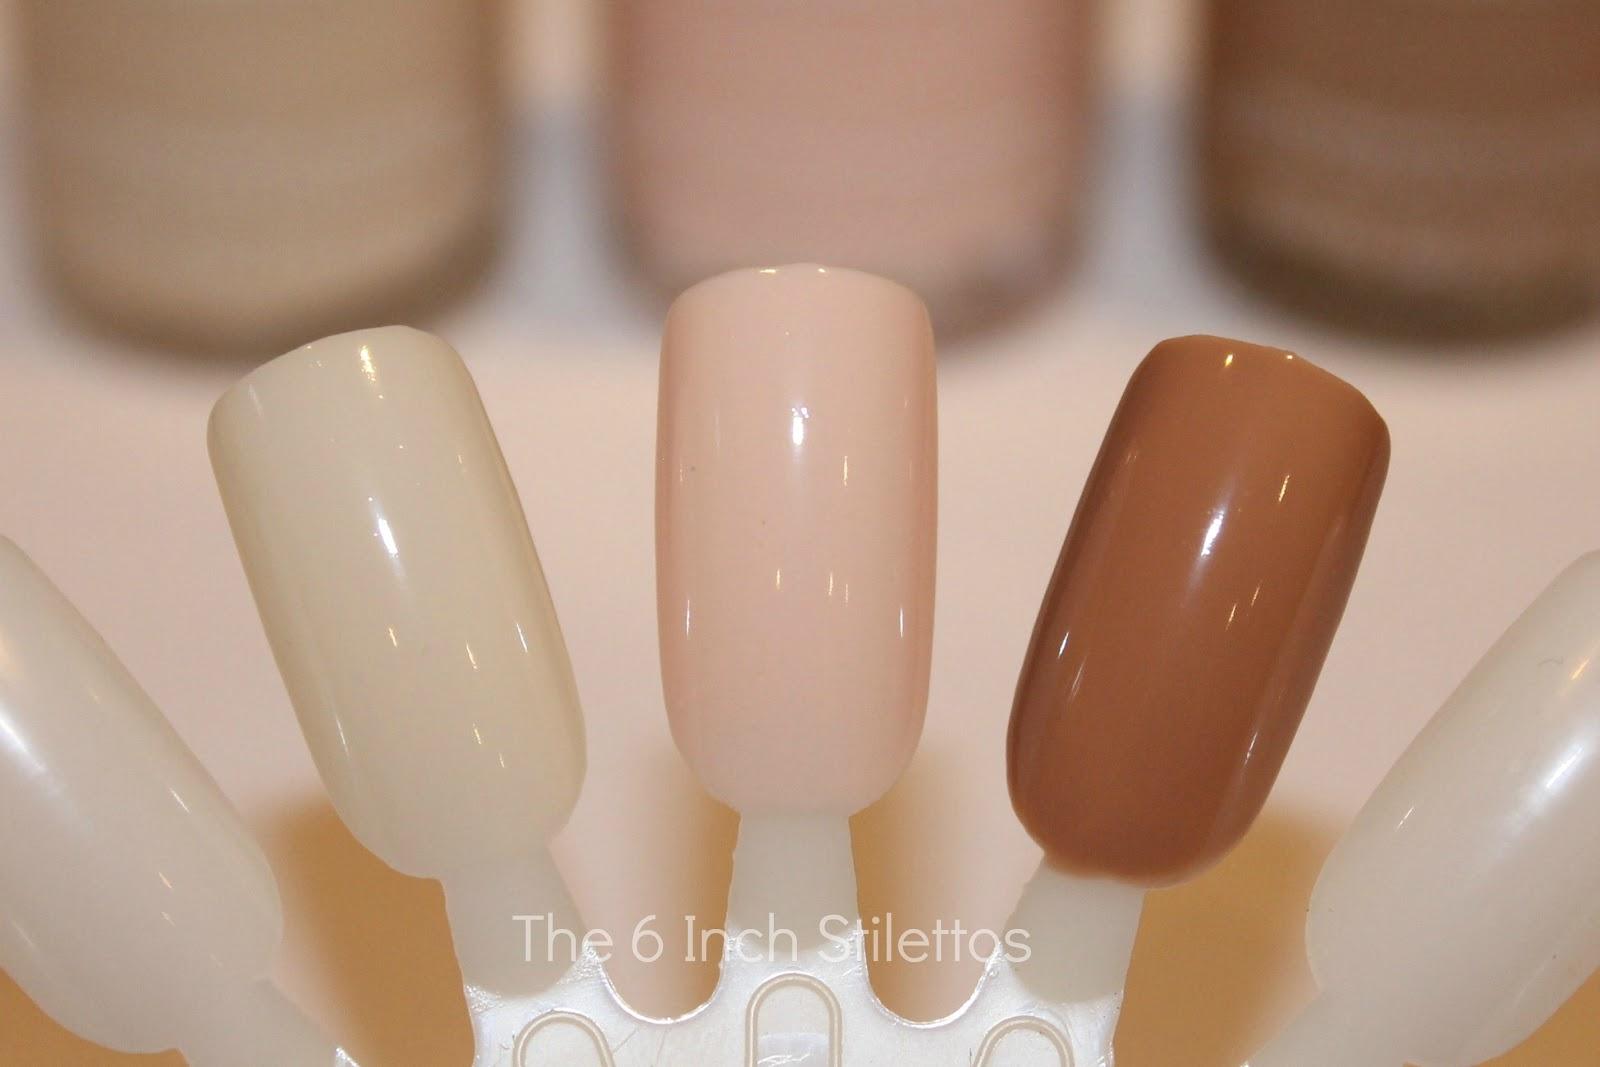 Revlon Colourstay Nail Enamel - Mannequin Hands ~ The 6 Inch Stilettos